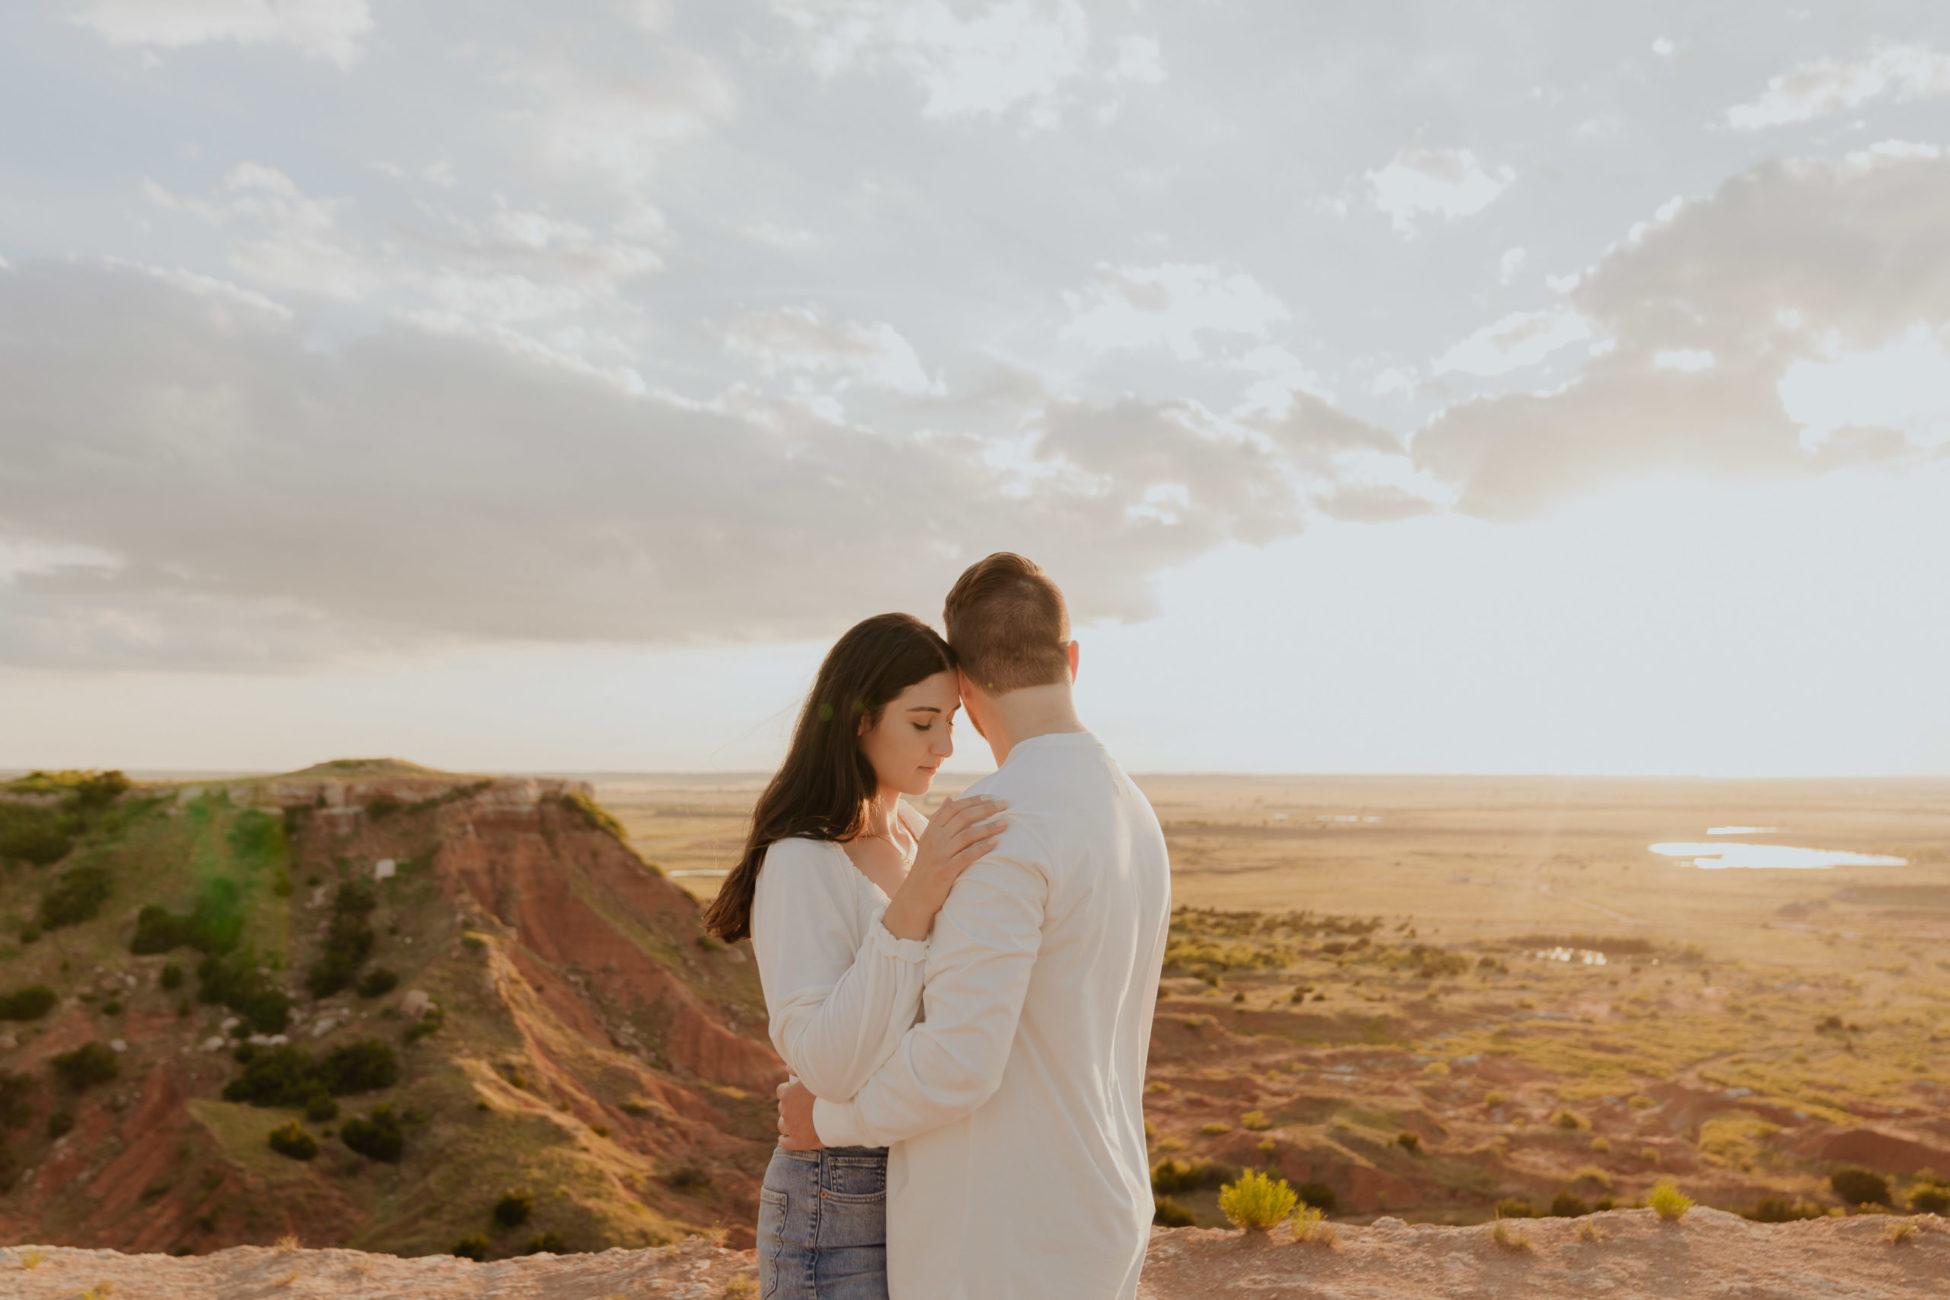 gloss-mountain-sunset-engagement-photo-oklahoma-photographer